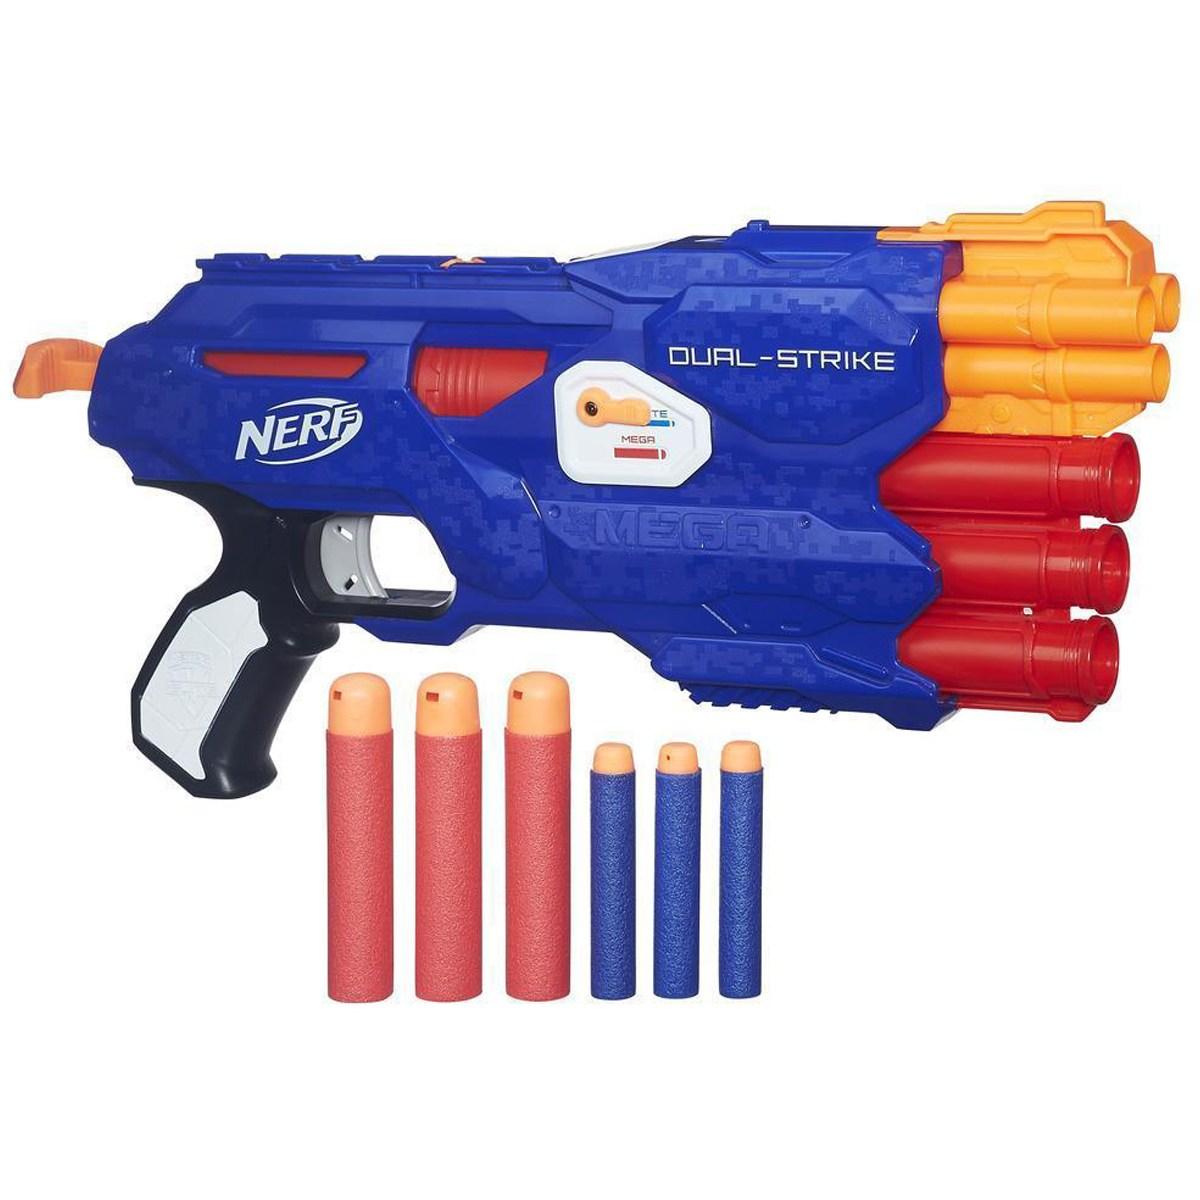 تفنگ بازی نرف مدل Dual Strike